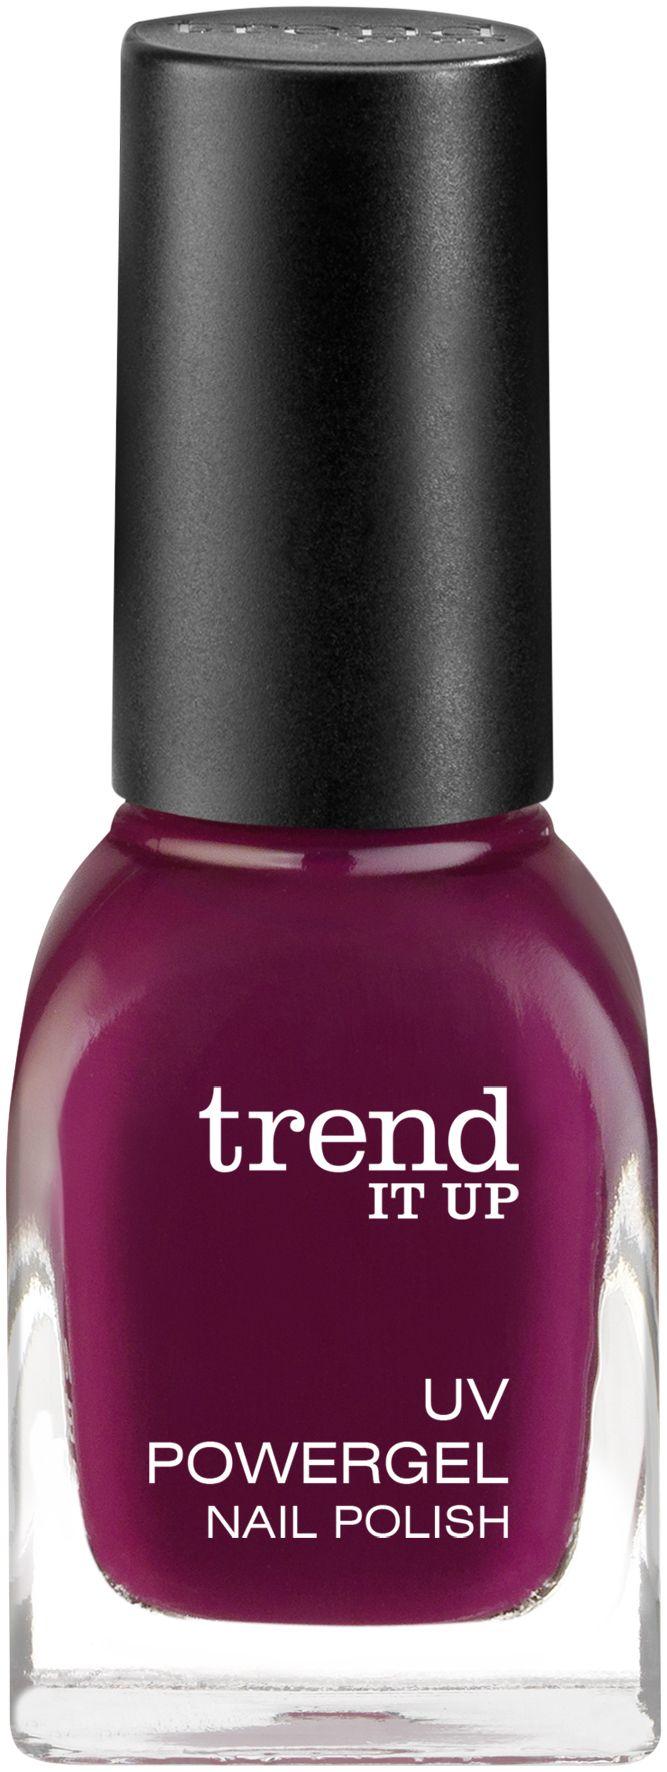 trend IT UP Sortimentswechsel September 2017 - Nagel Die neuen Trend ...